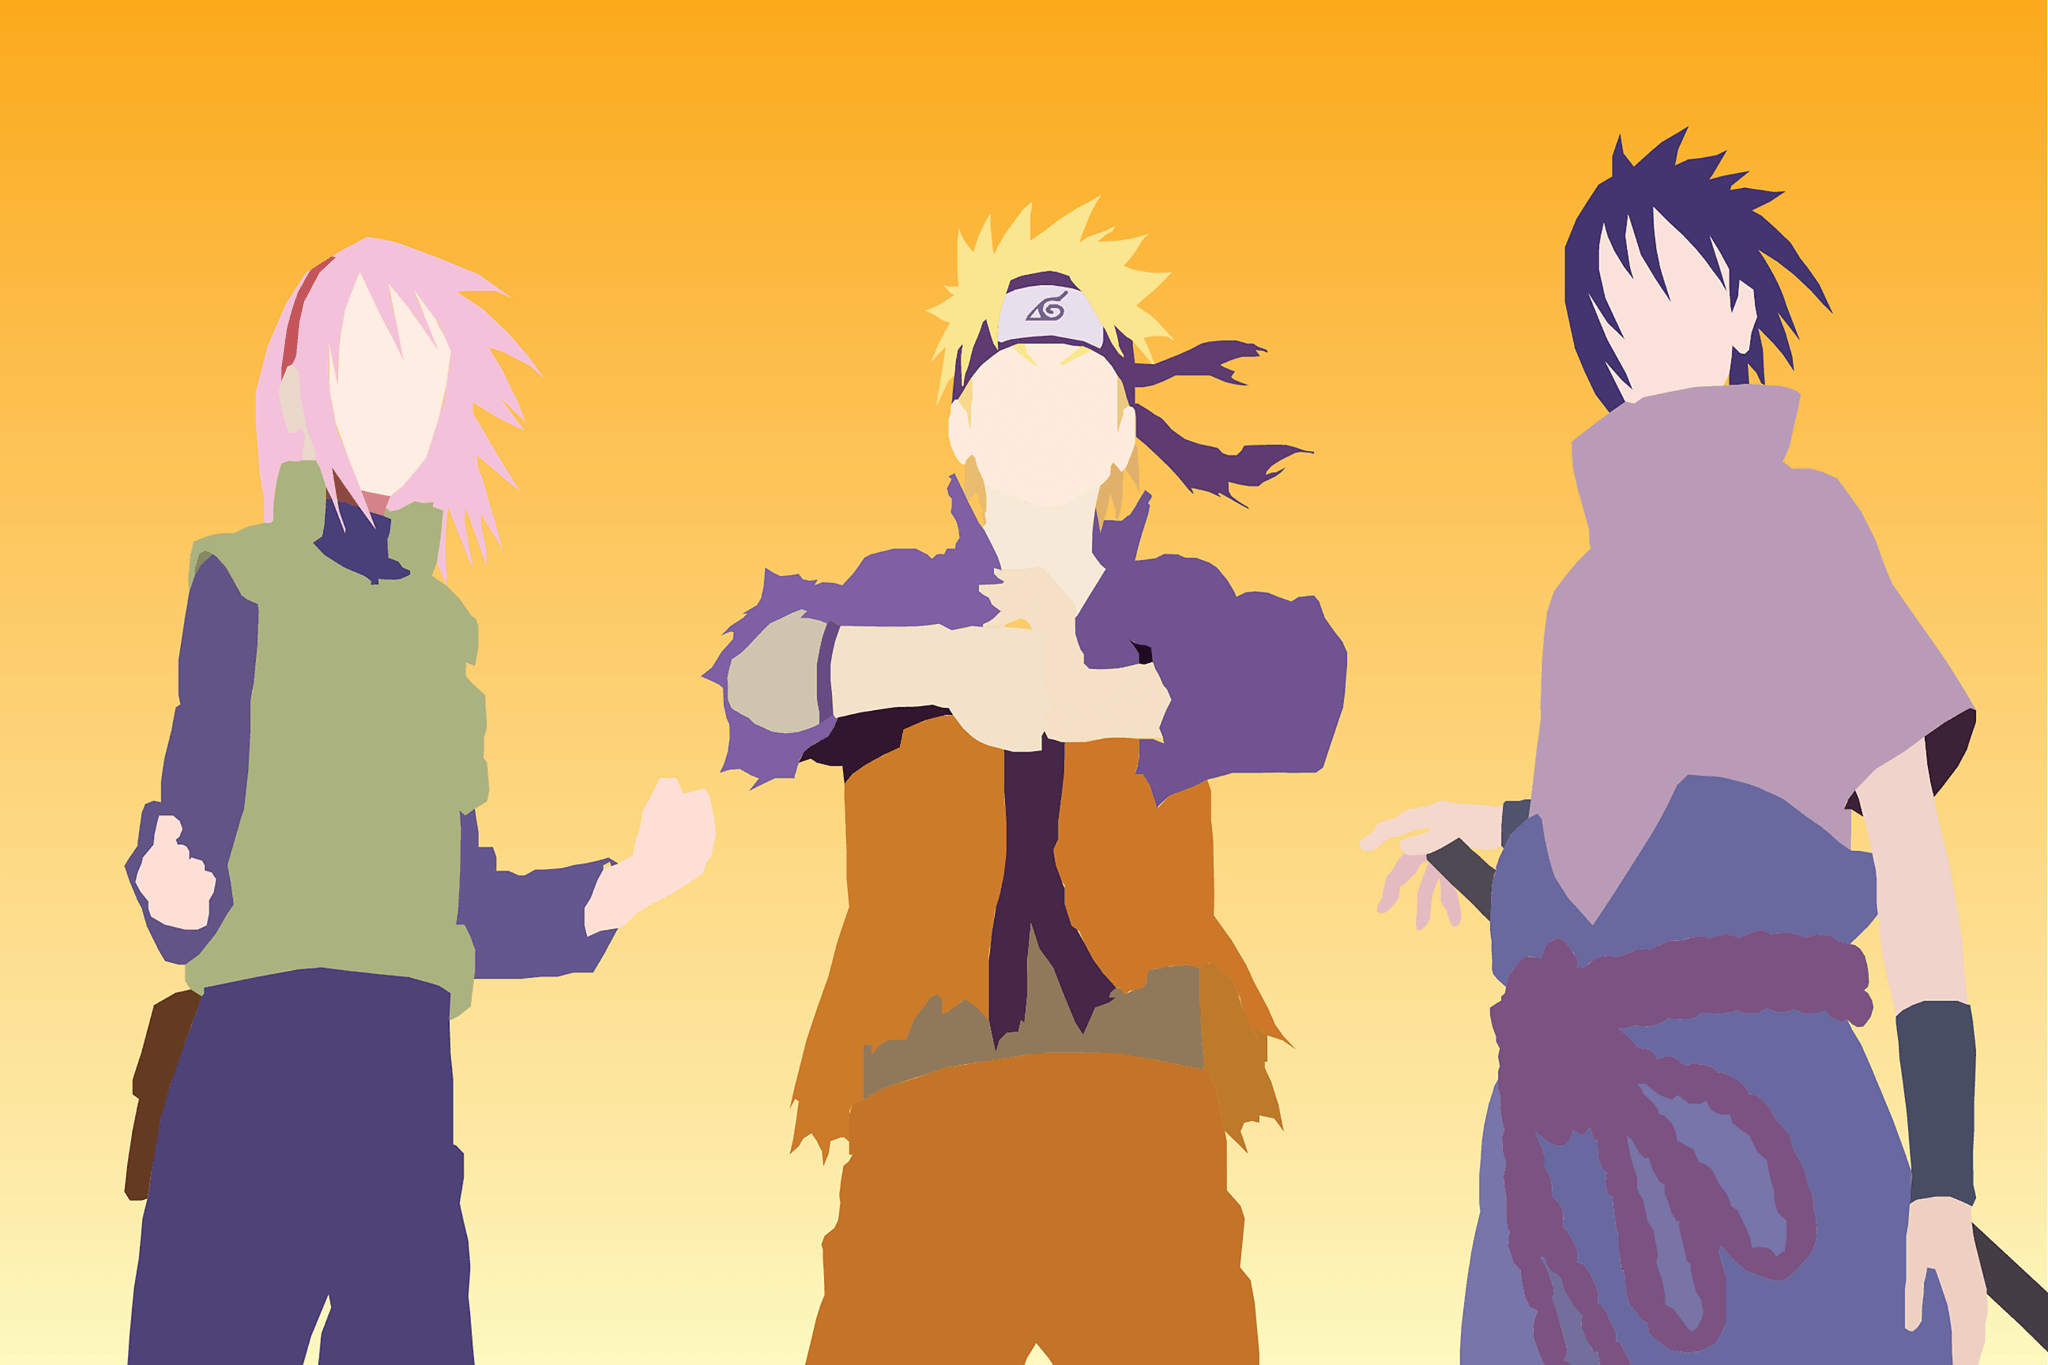 Naruto Hypebeast Wallpapers - Top Free Naruto Hypebeast ...